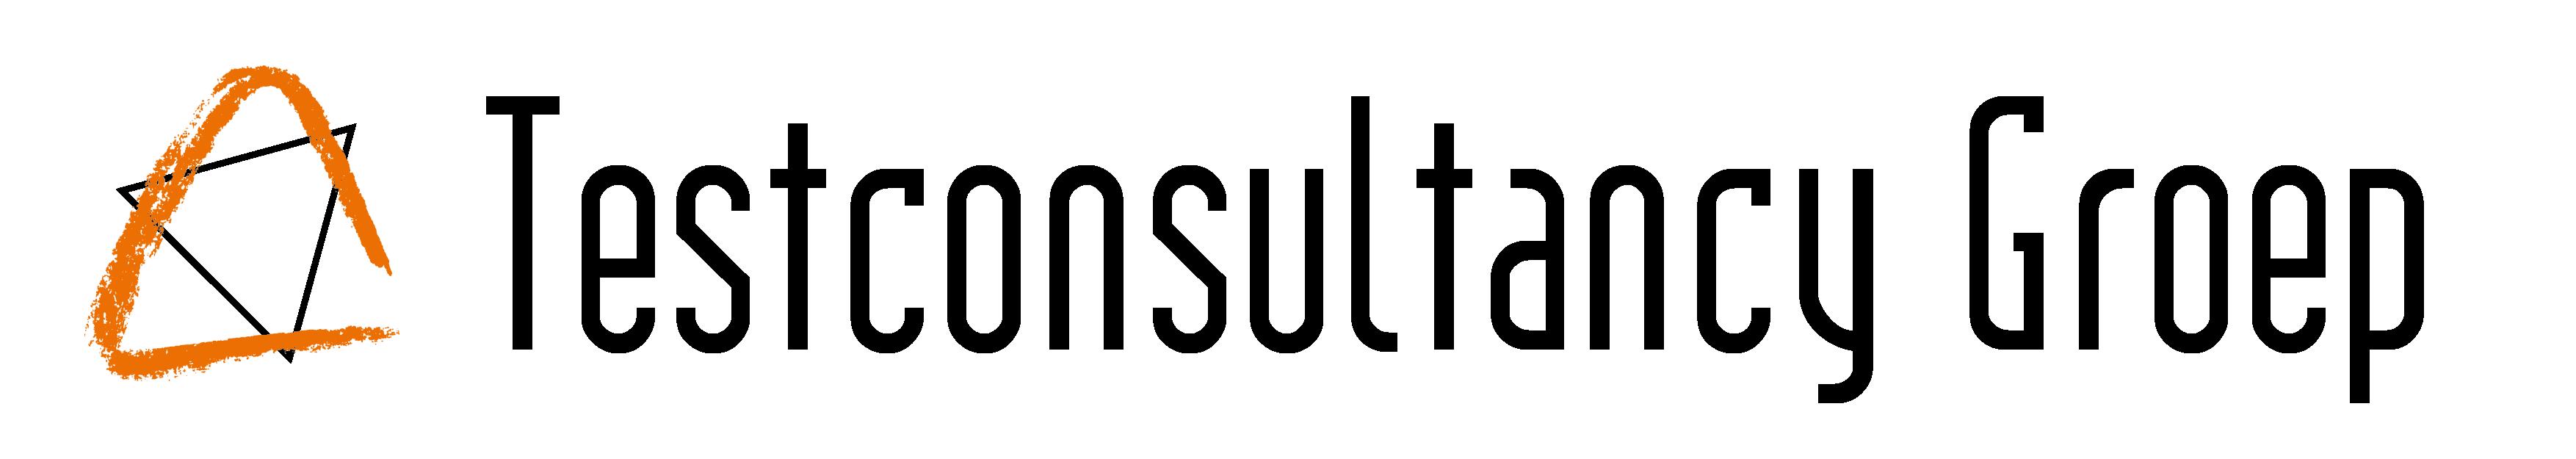 Testconsultancy Groep